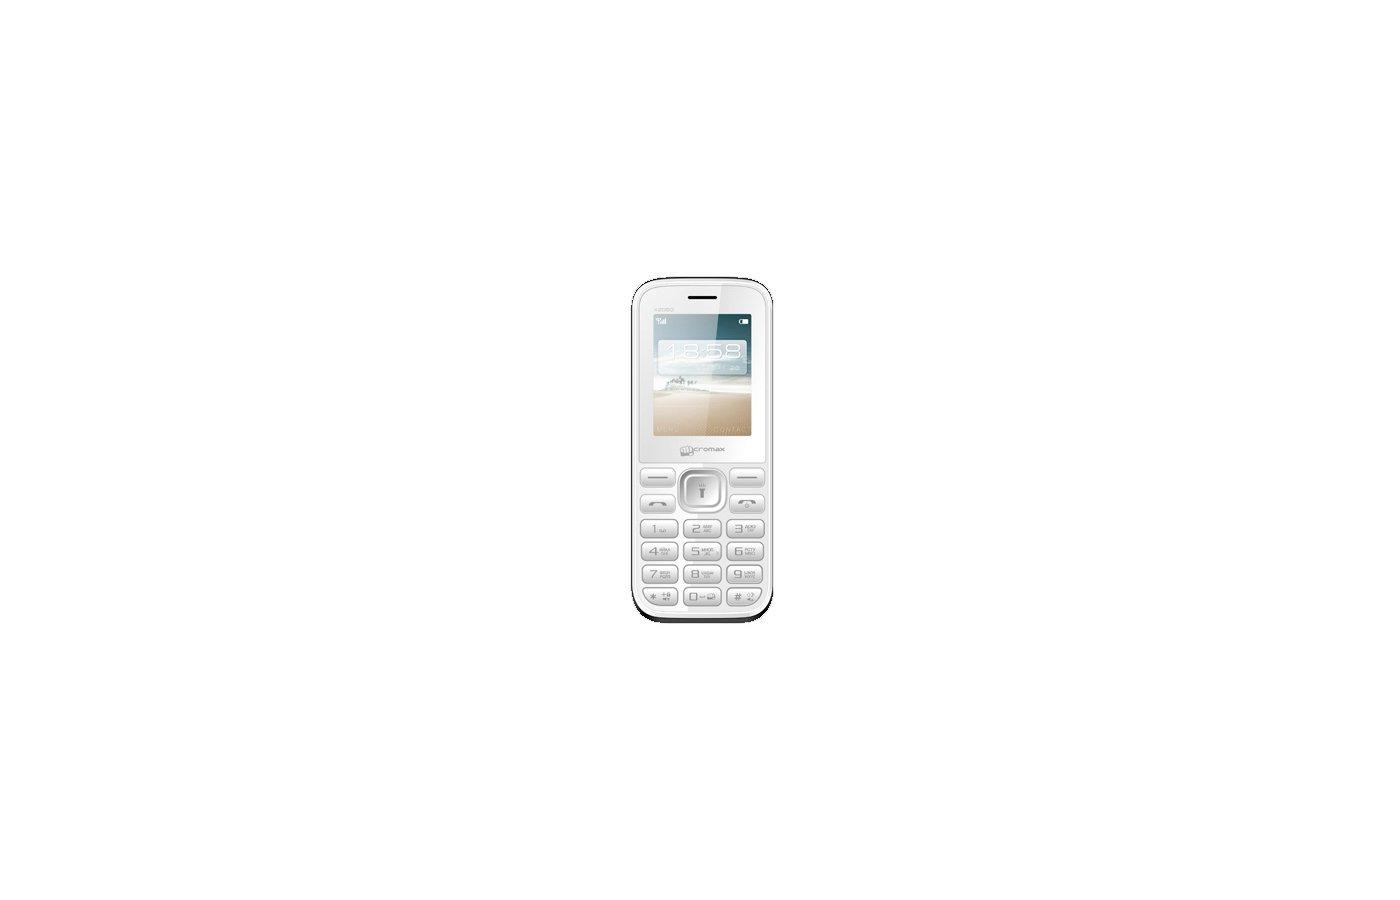 Мобильный телефон Micromax X2050 white